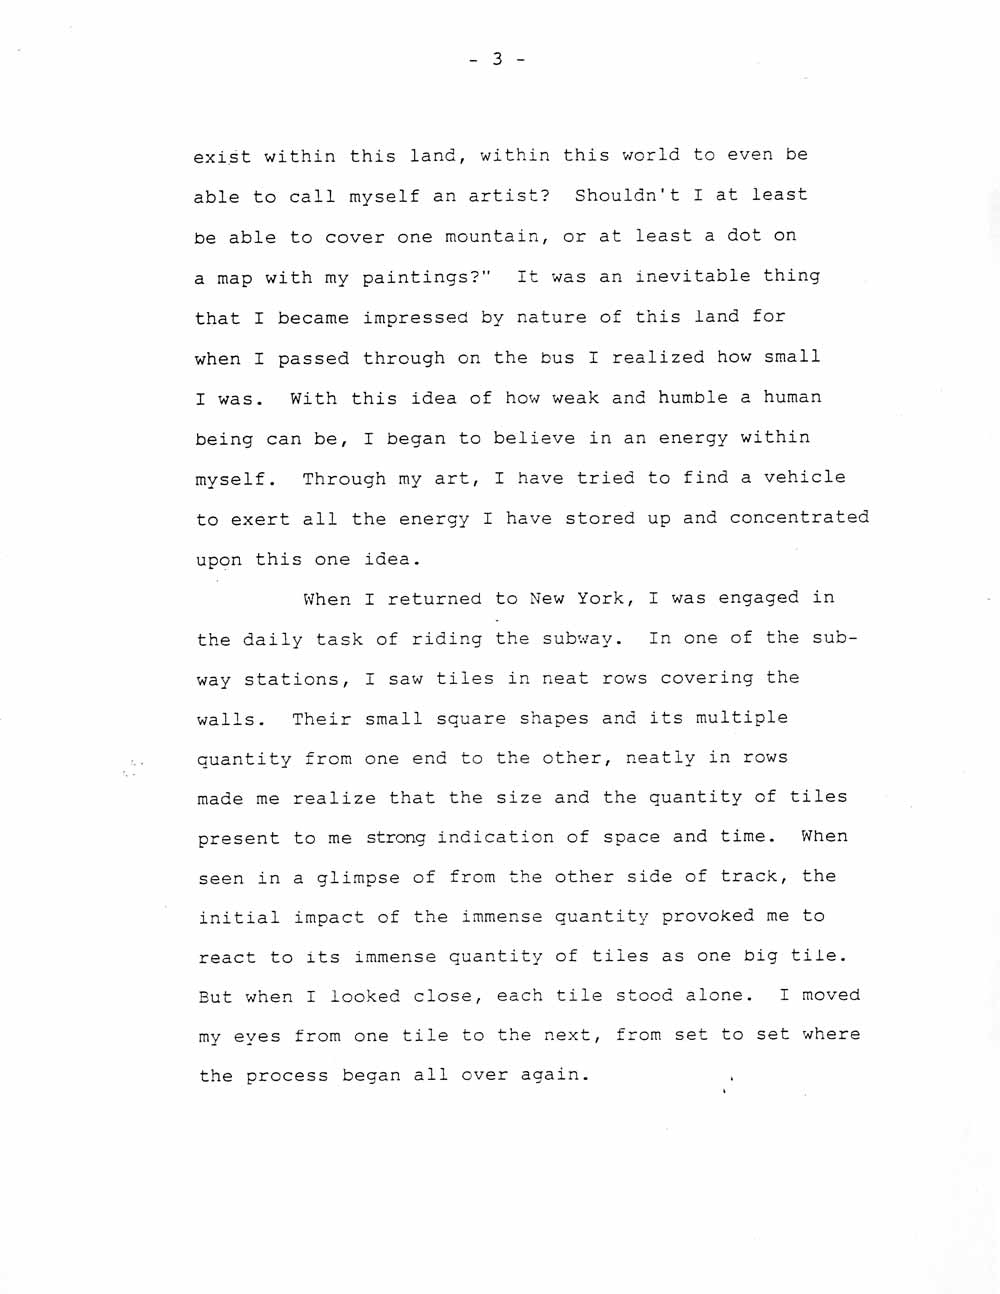 Ik-Joong Kang's Artist Statement, pg 3